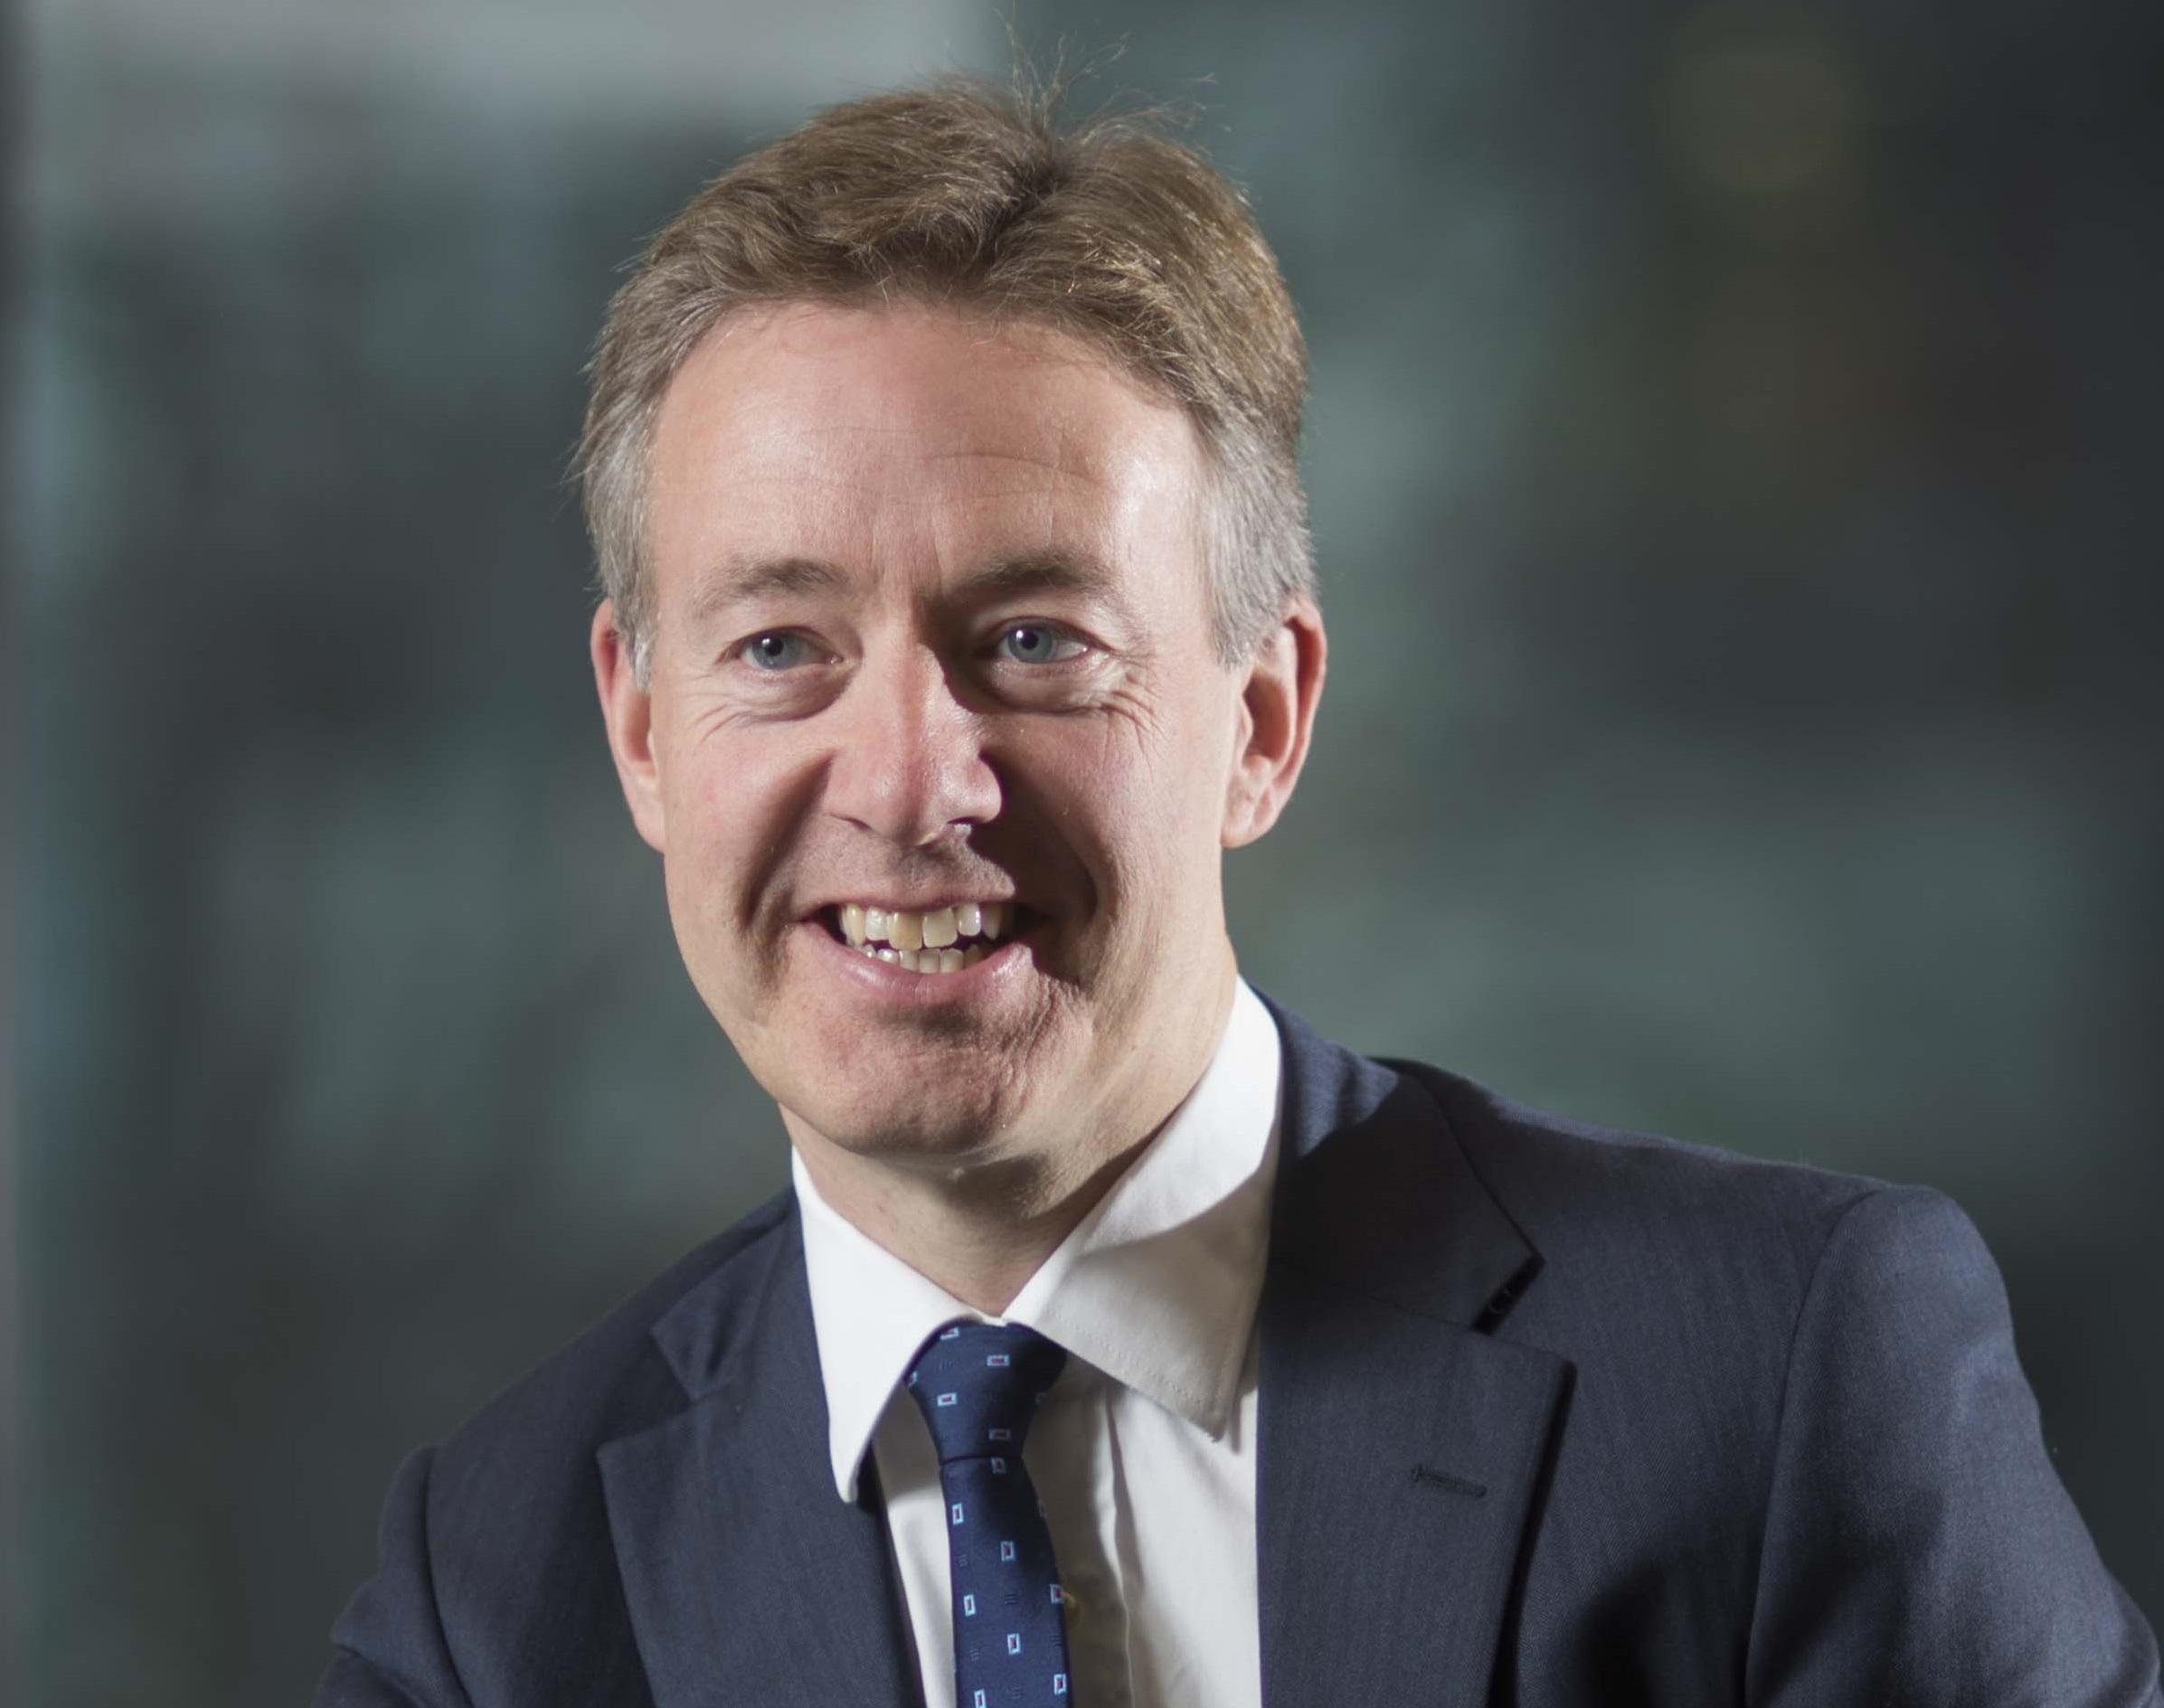 PwC report shows Bradford Assurance Centre created 120 jobs